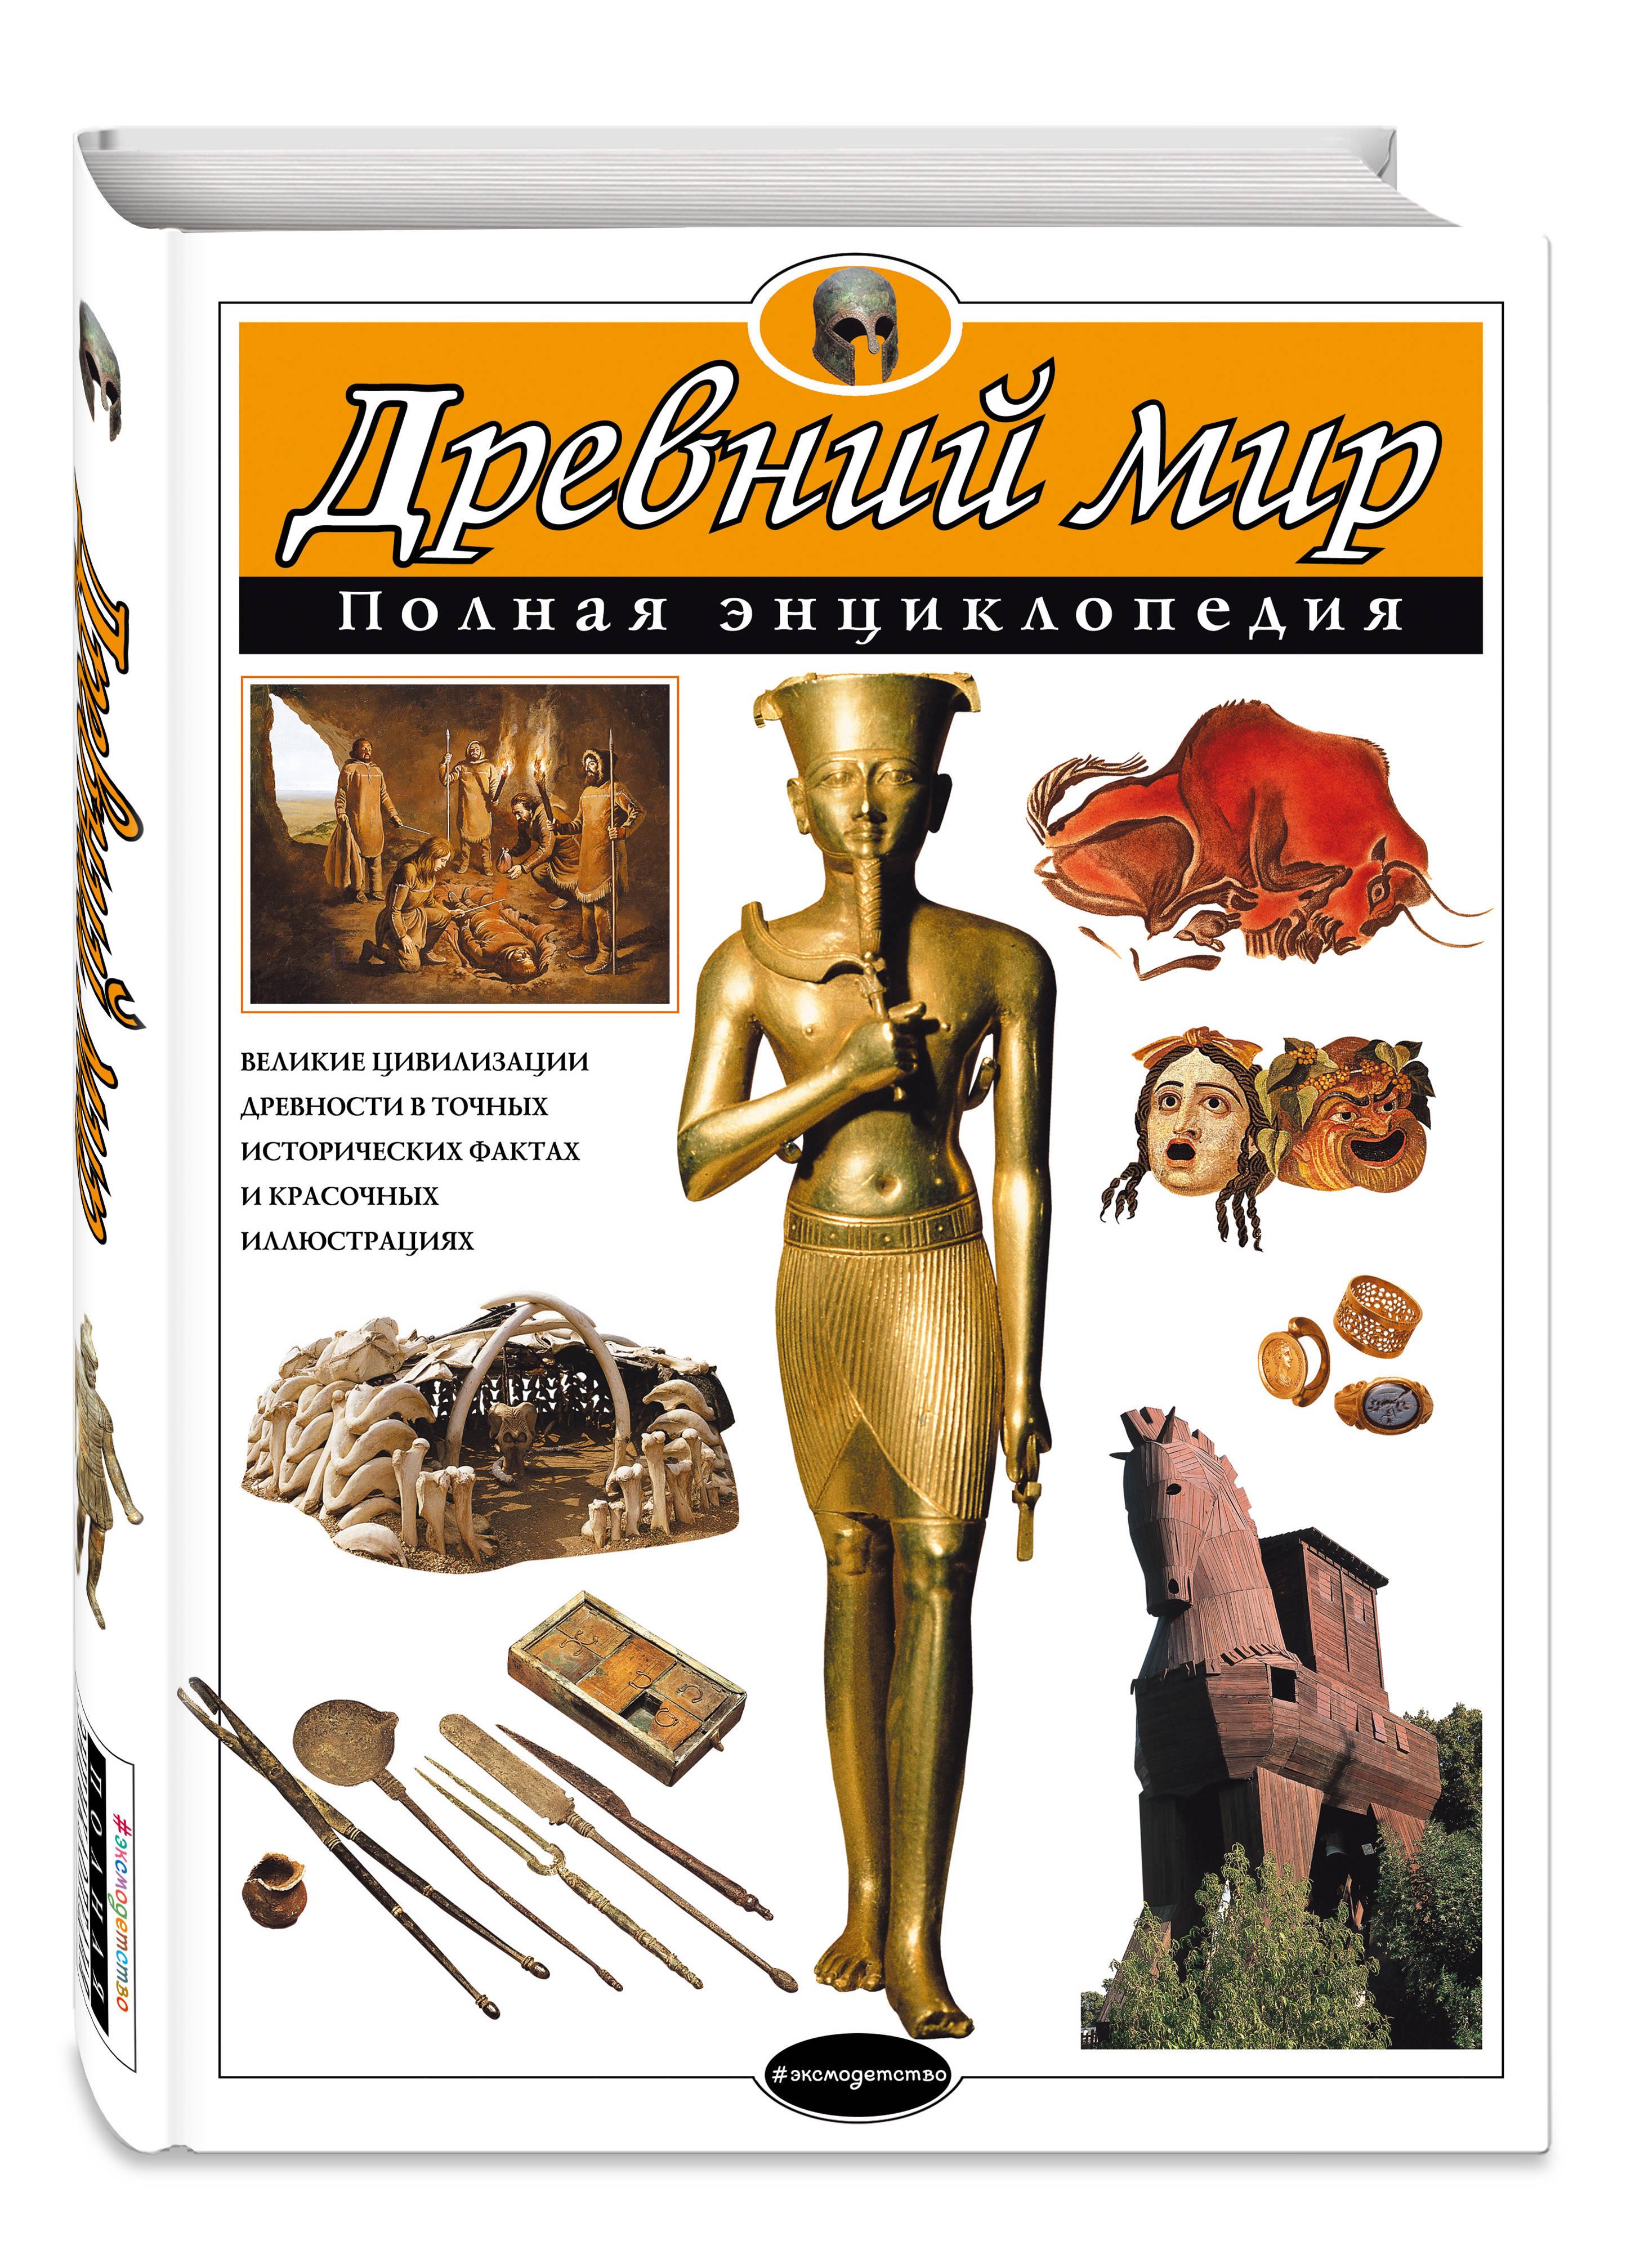 Древний мир. Полная энциклопедия ( Хардман Ш., Стил Ф., Теймс Р.  )